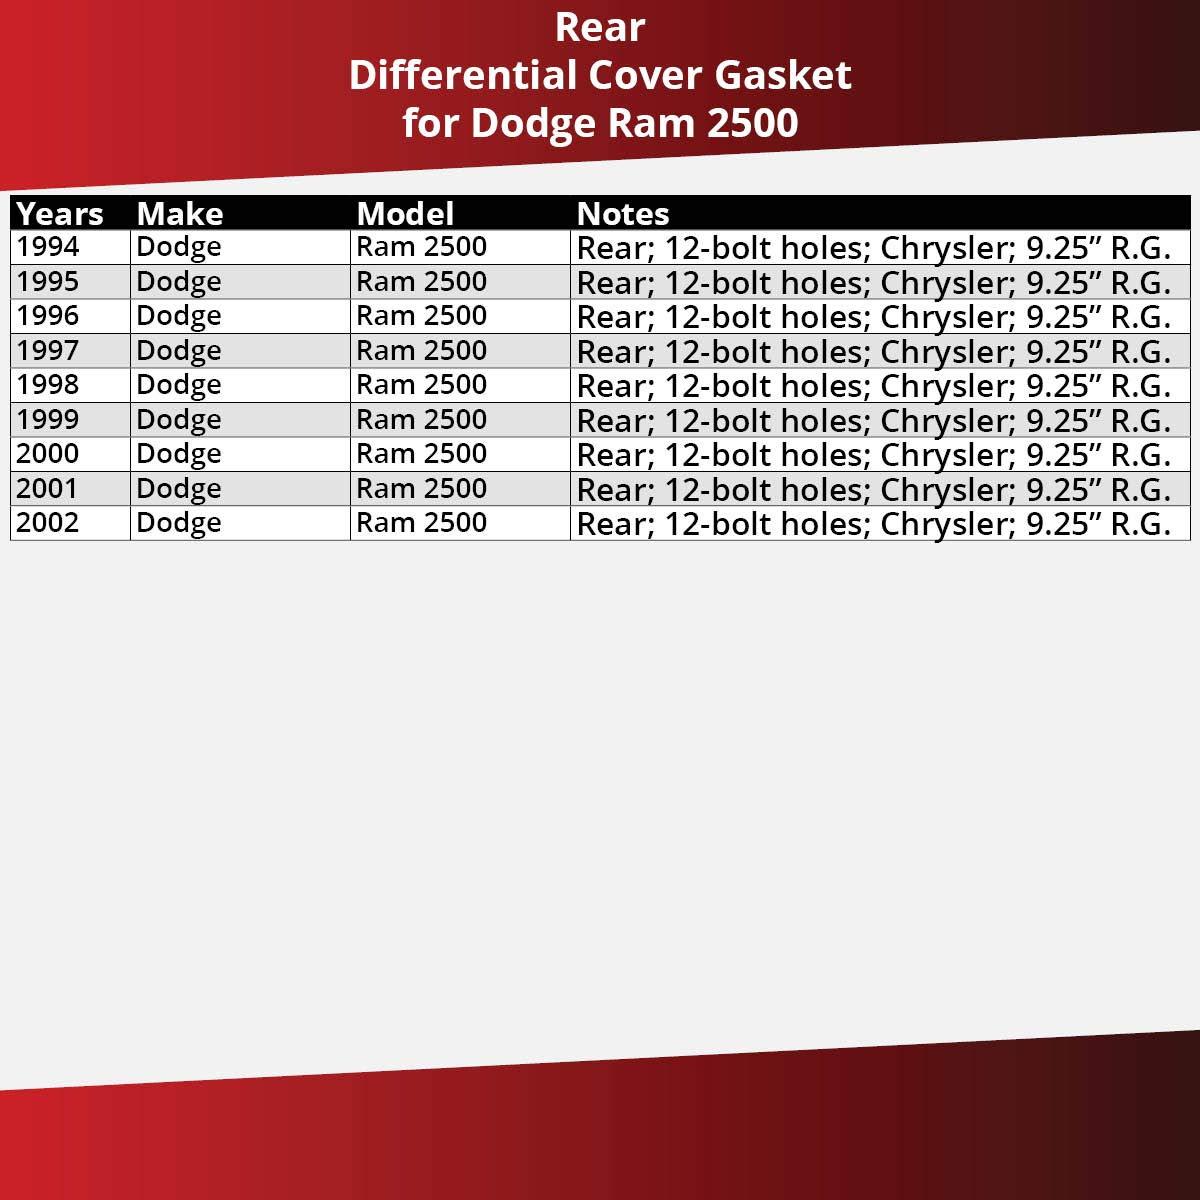 Fel-Pro Rear Differential Cover Gasket for 1994-2002 Dodge Ram 2500 FelPro Drivetrain Sealing Gaskets